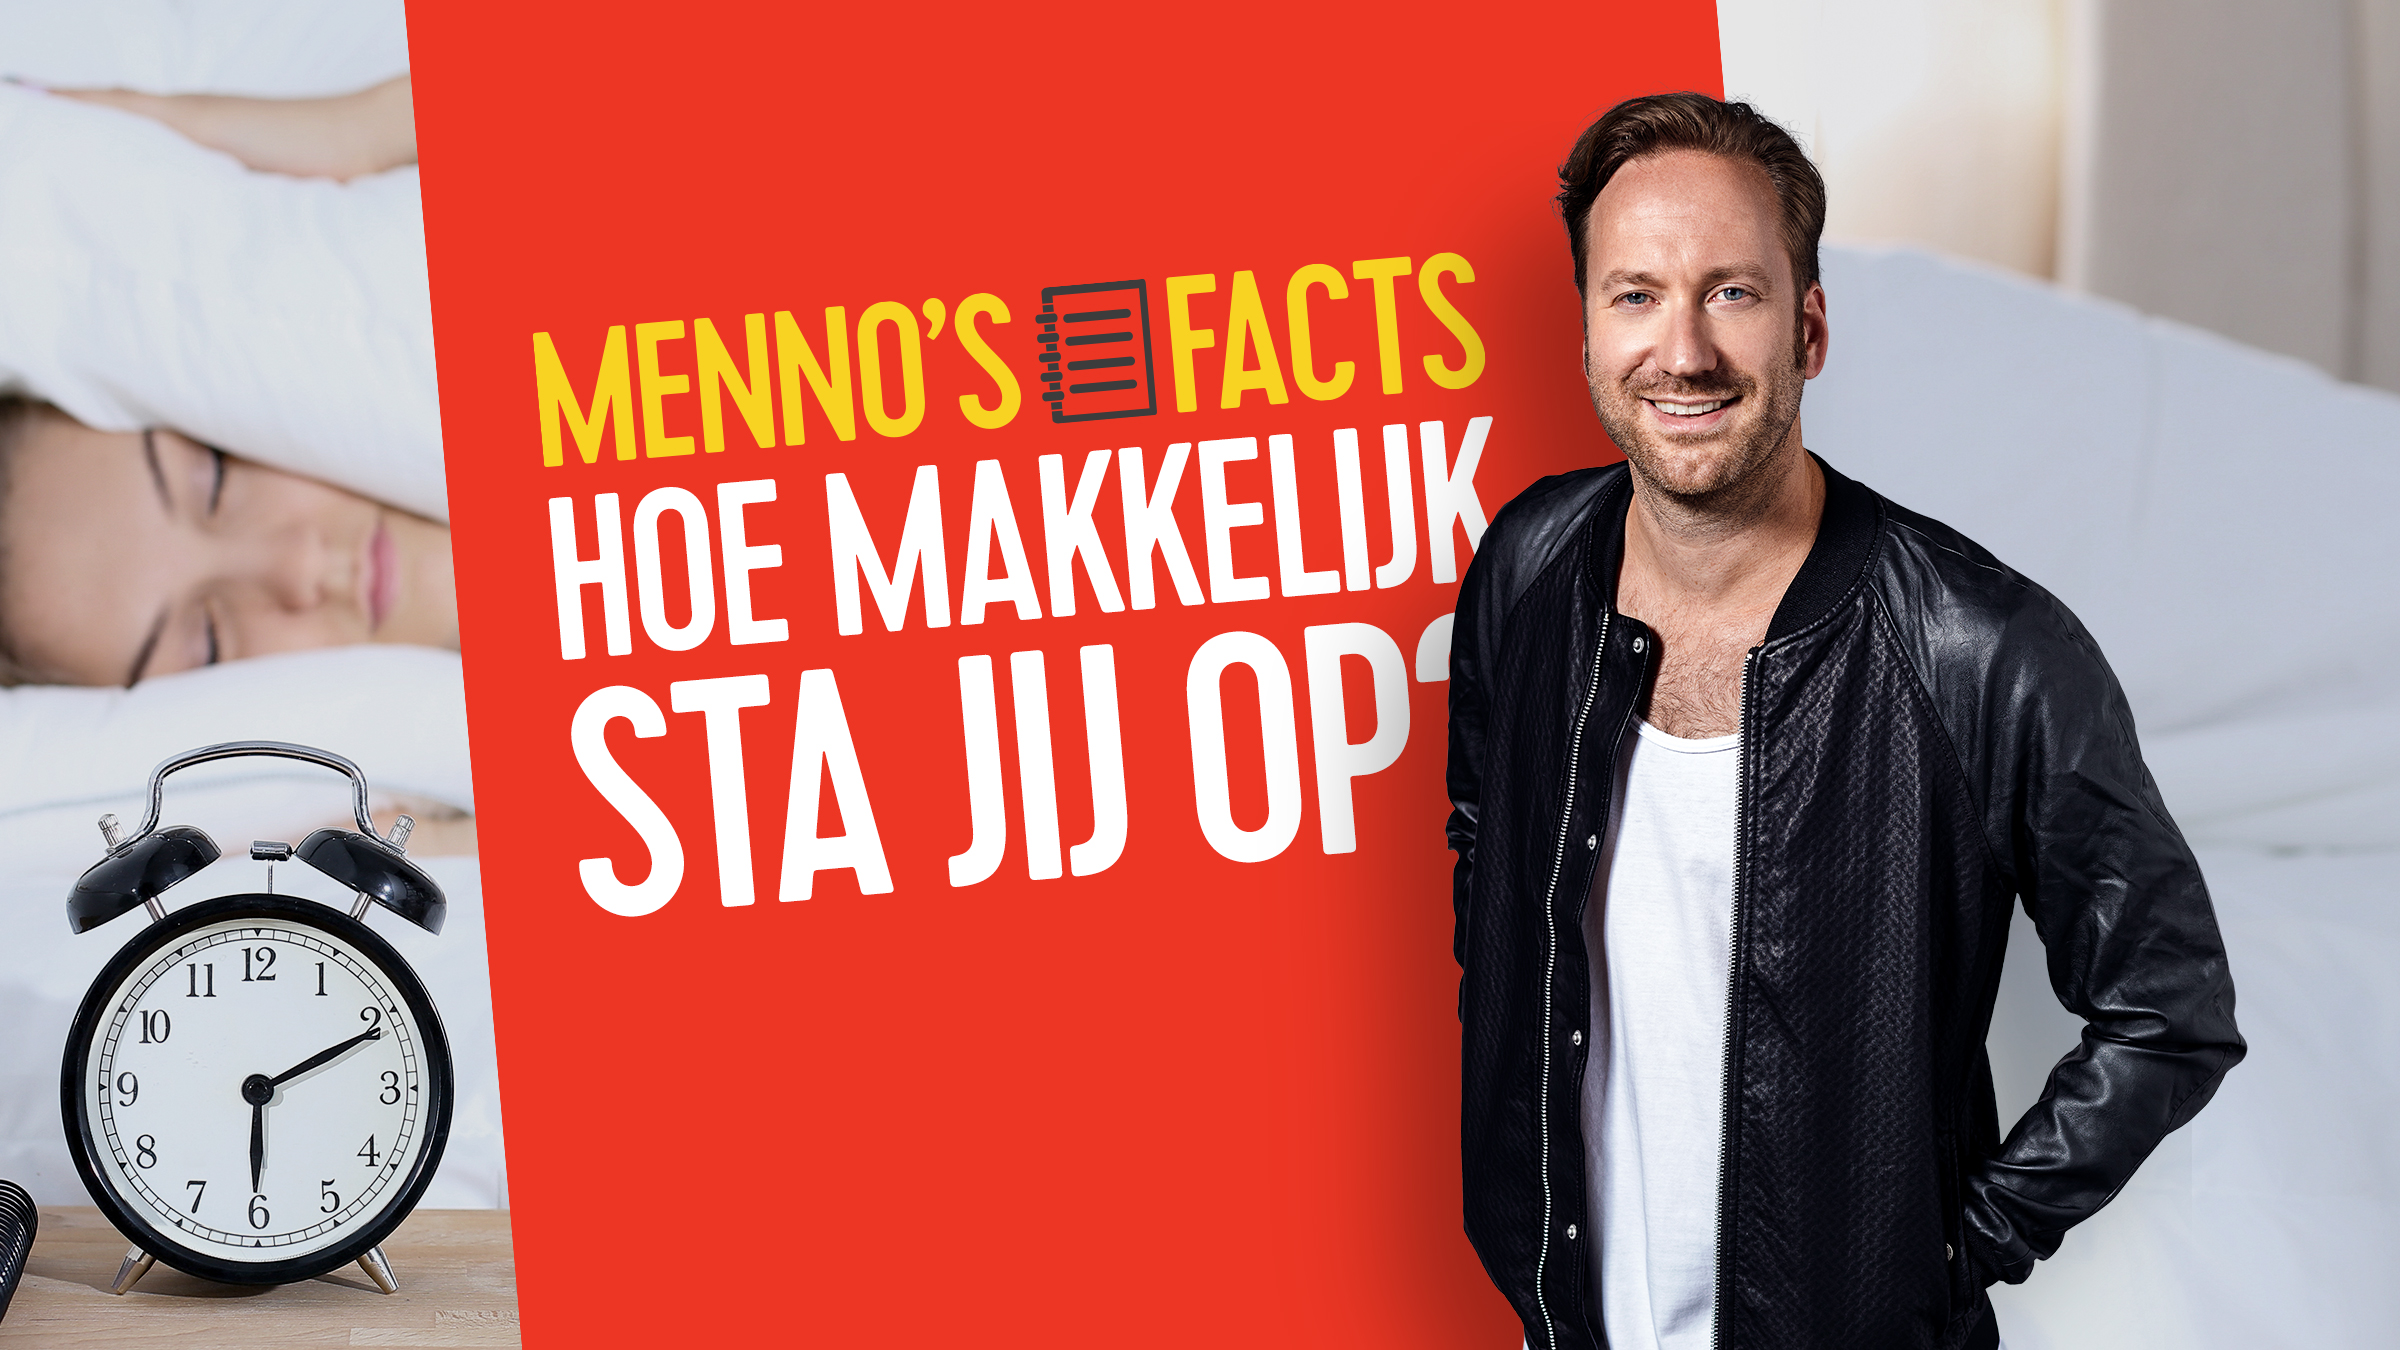 Wakkerworden teaser basis mennosfacts17